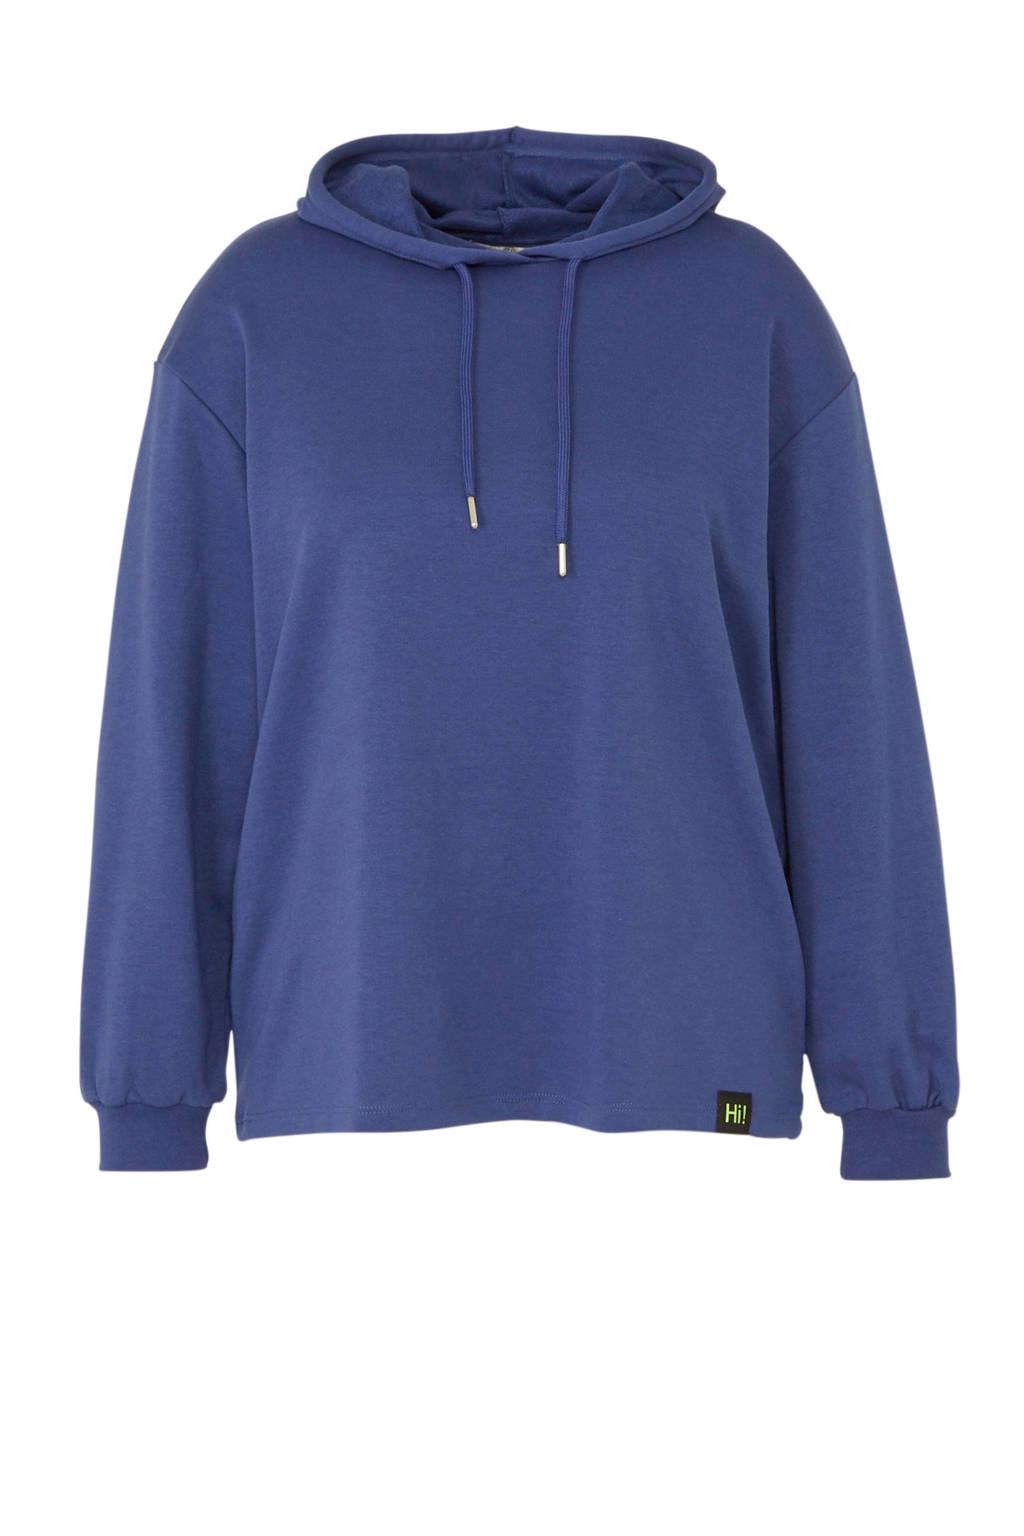 C&A XL Clockhouse hoodie blauw, Blauw